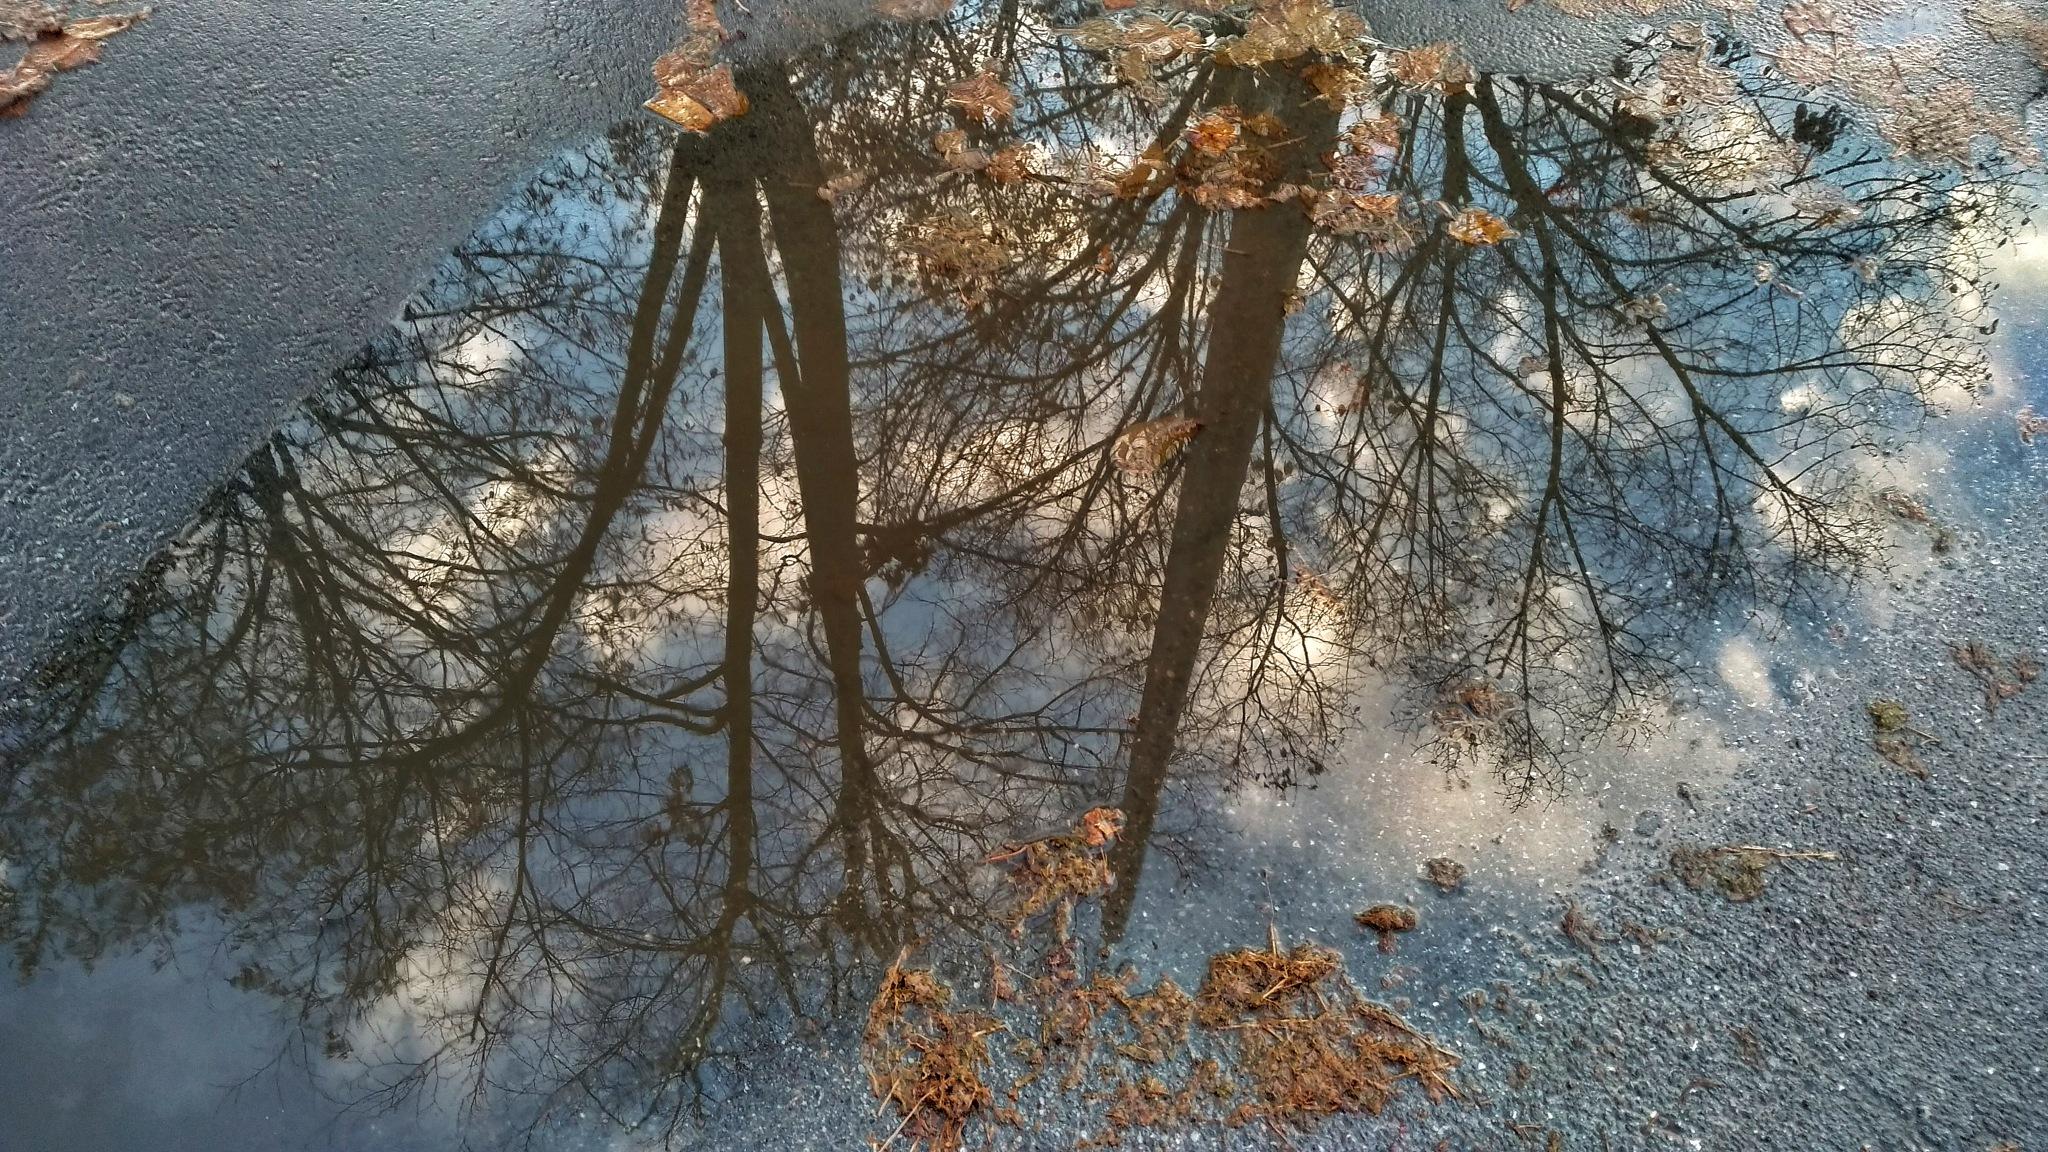 After rain by Ana-Marija Veg